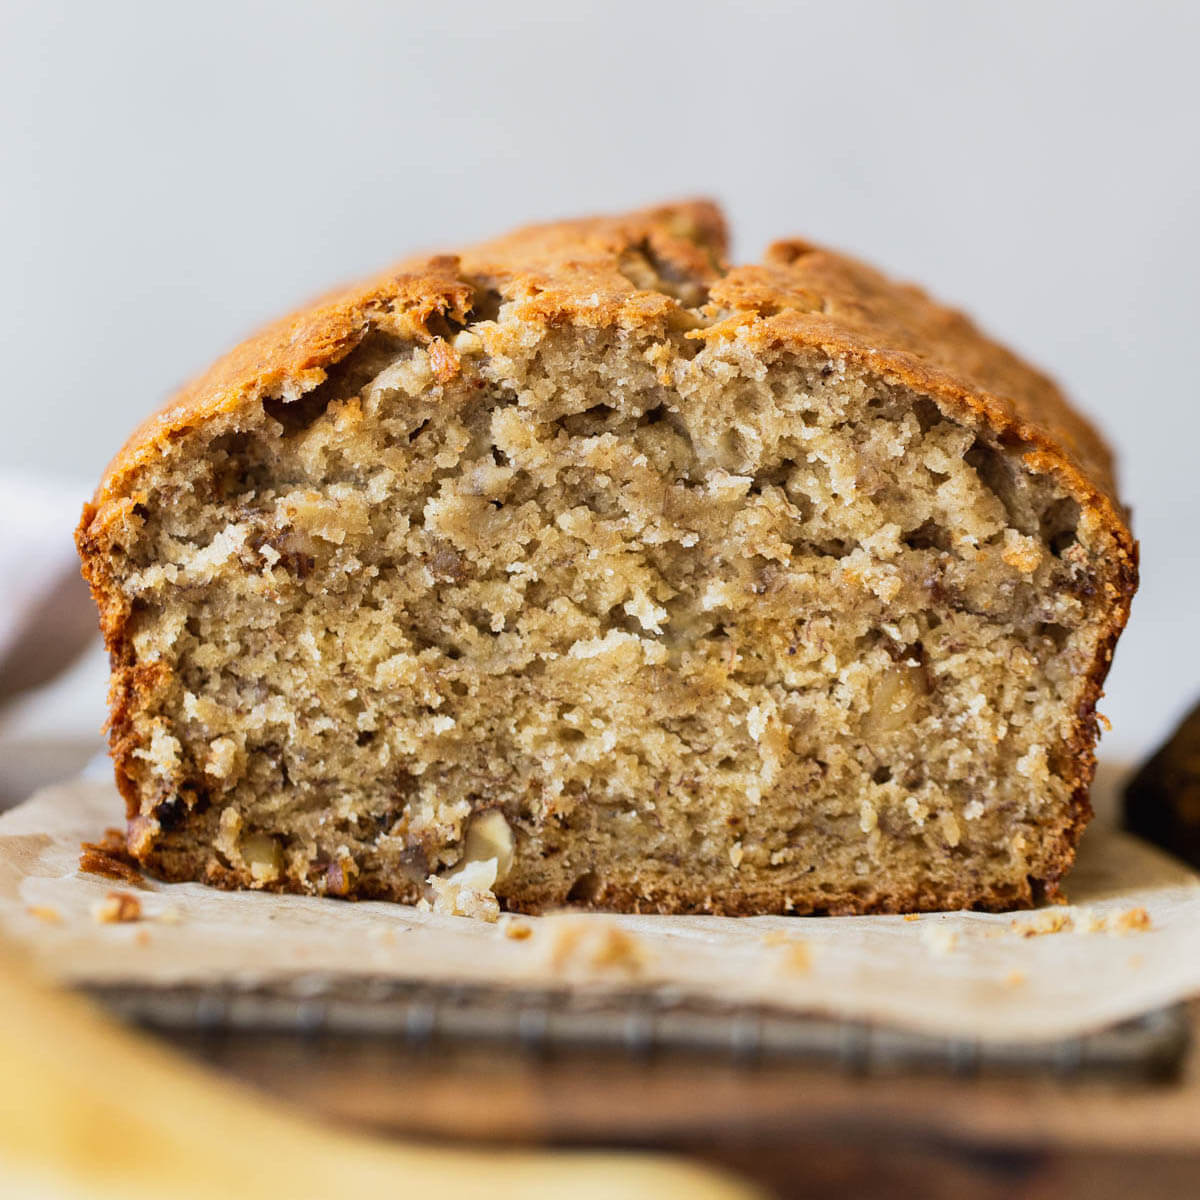 Classic Banana Bread Recipe - Live Well Bake Often